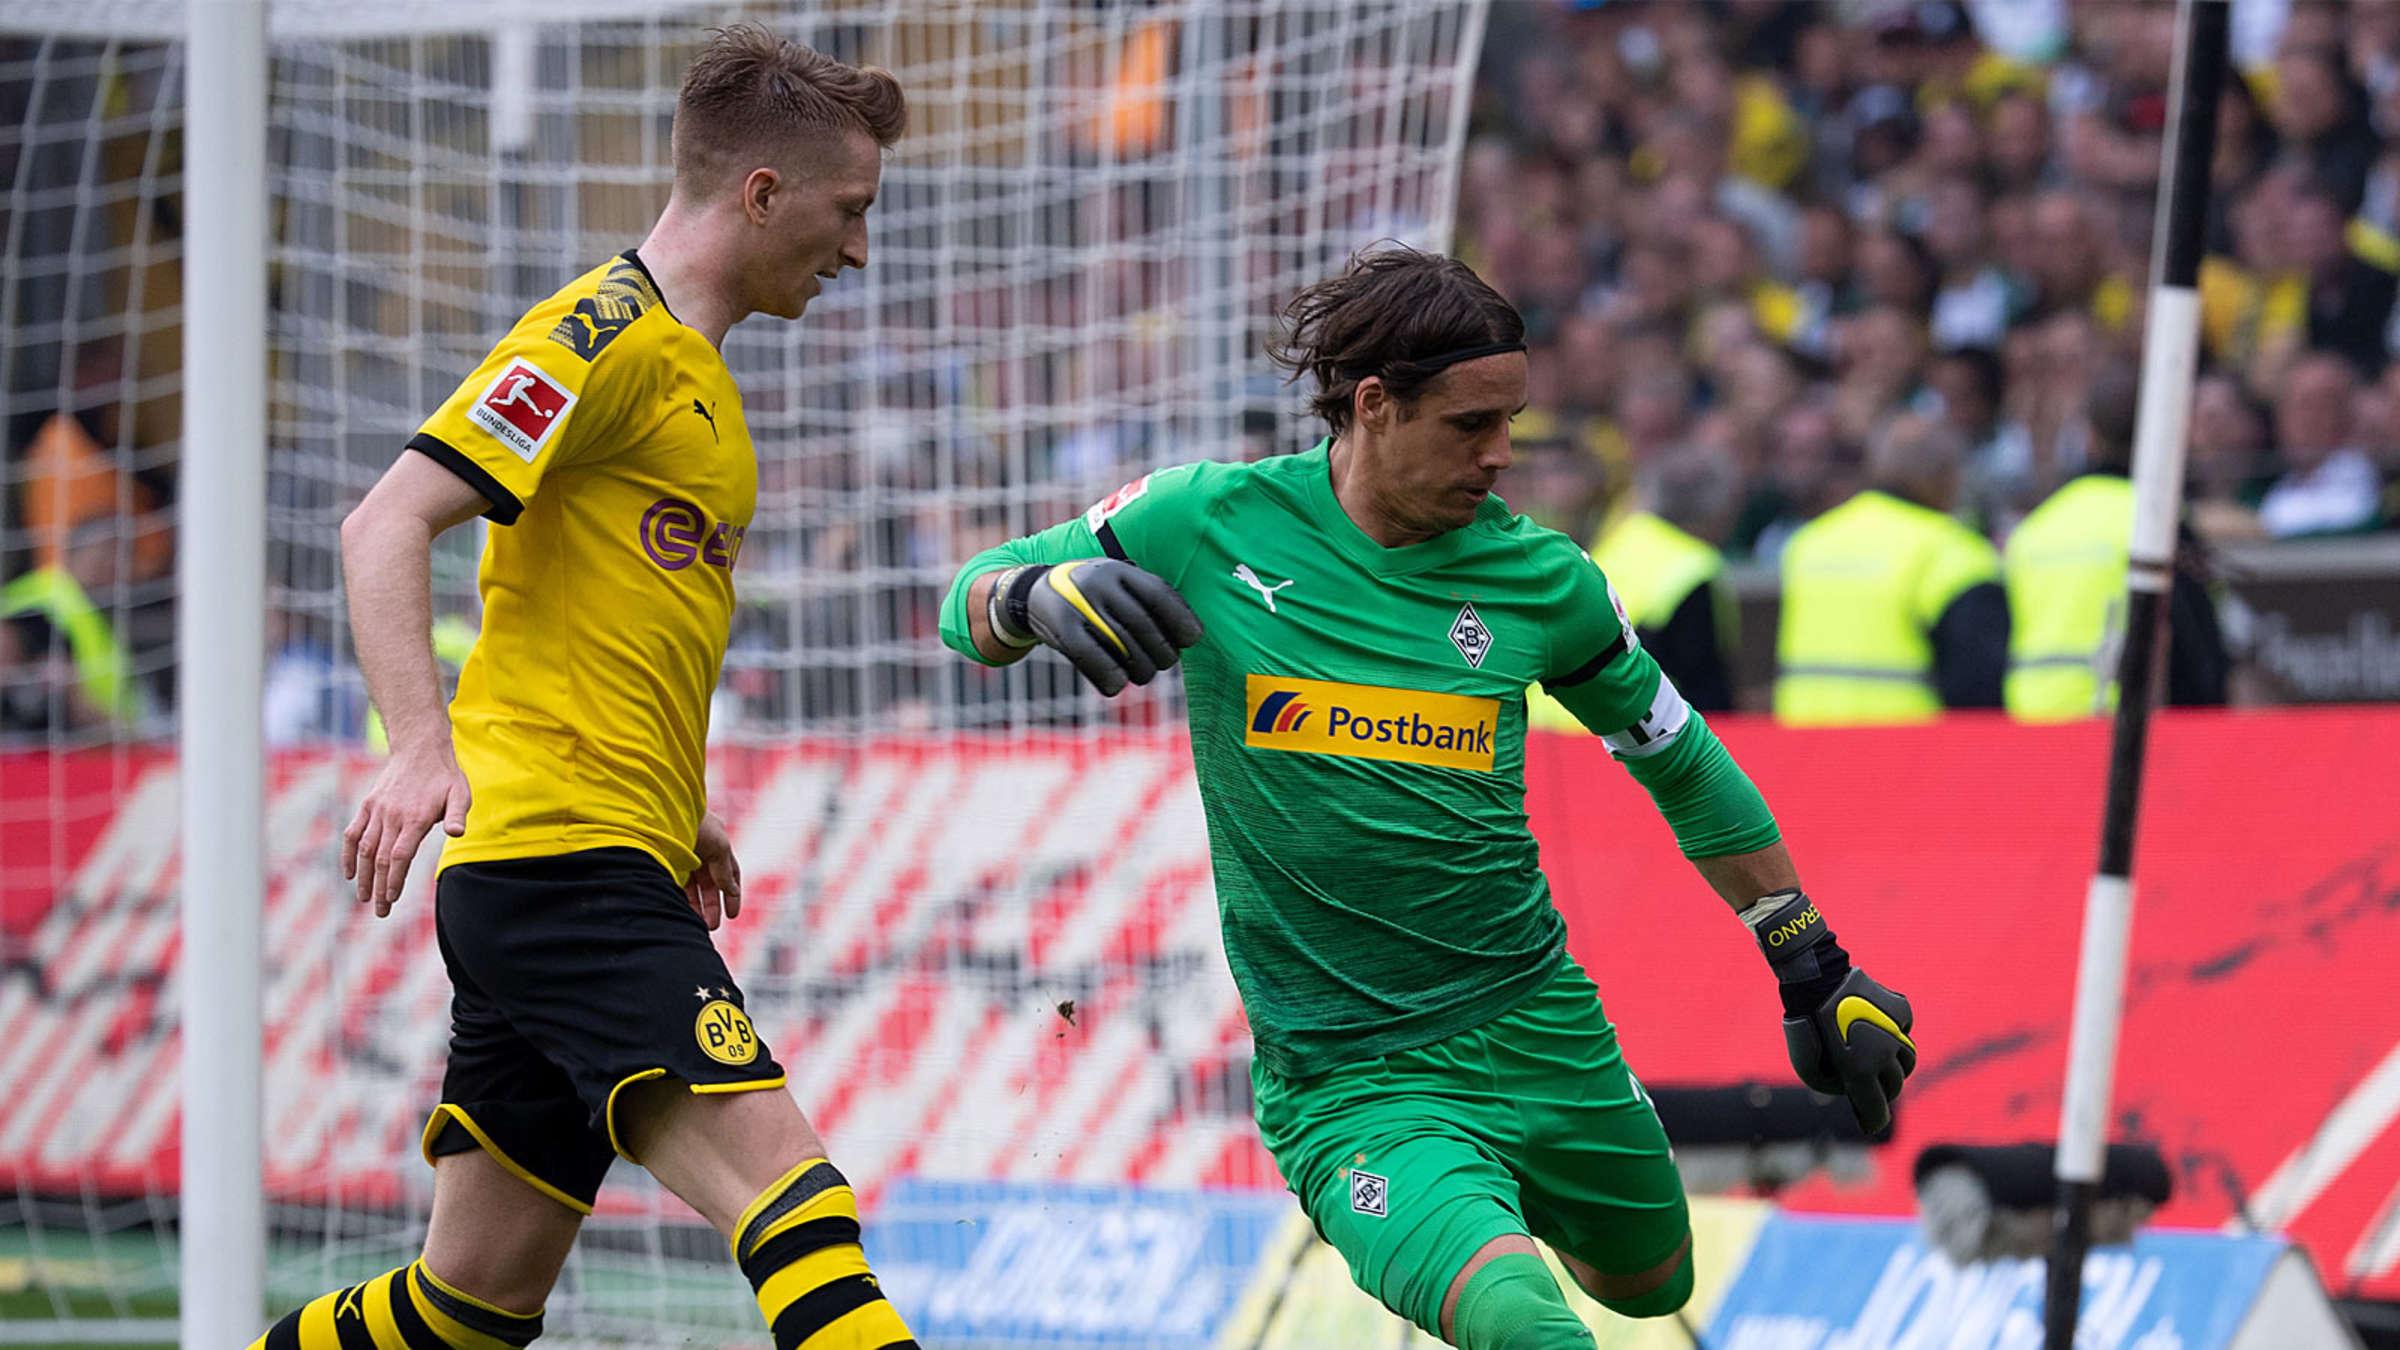 Borussia Dortmund - Borussia Mönchengladbach: Bundesliga heute live im TV  und Live-Stream | Fußball